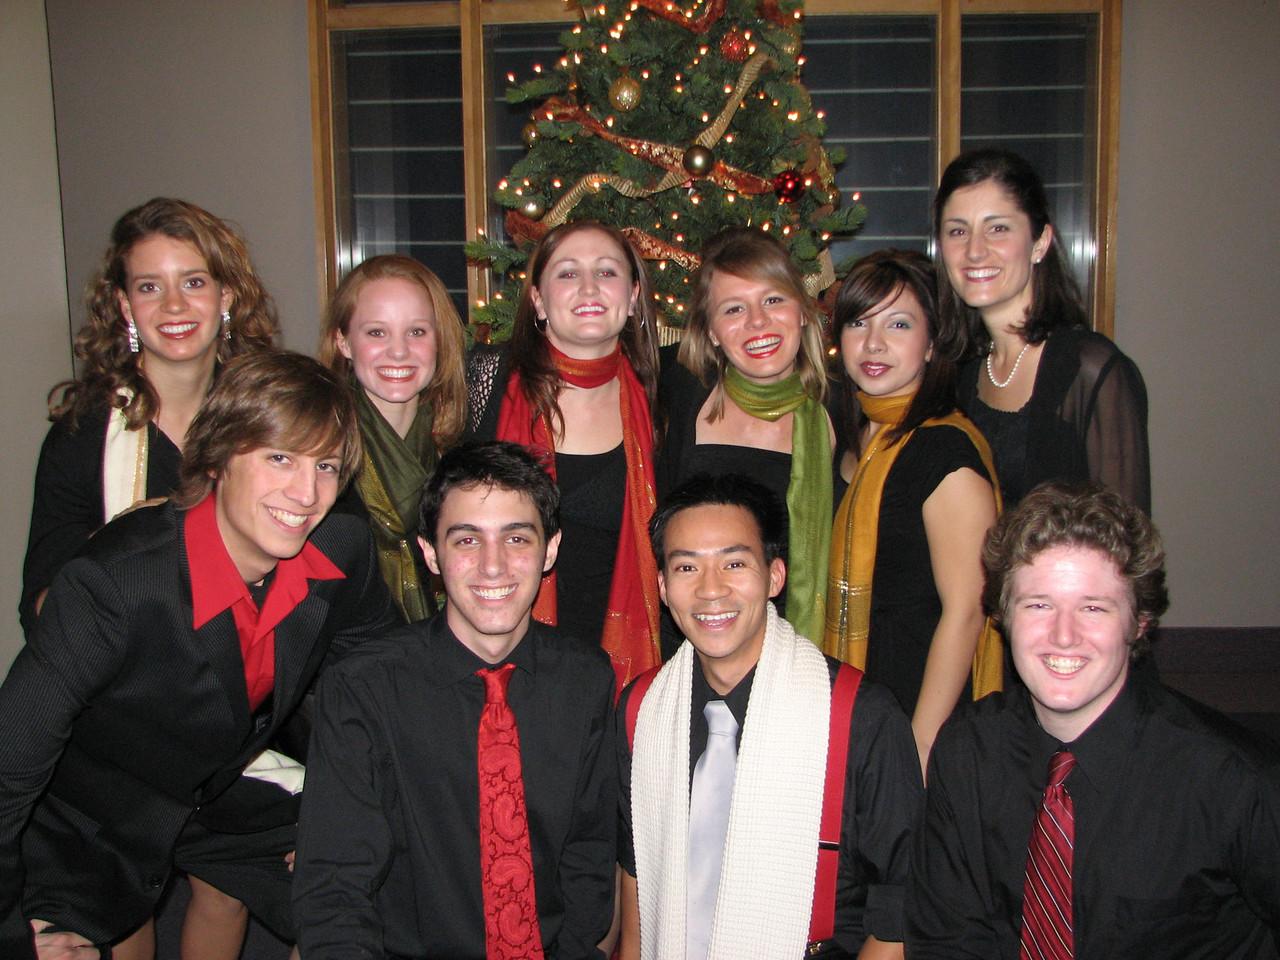 2006 12 09 Sat - Biola Vocal Jazz Ensemble 3 - Laura Coghlan, Heather Onken, Heidi Bargen, Charissa Noble, Jessi Vasquez, Shawna Stewart, Dan Rigall, Trevor Gomes, Ben Yu, & Jordan Johnson